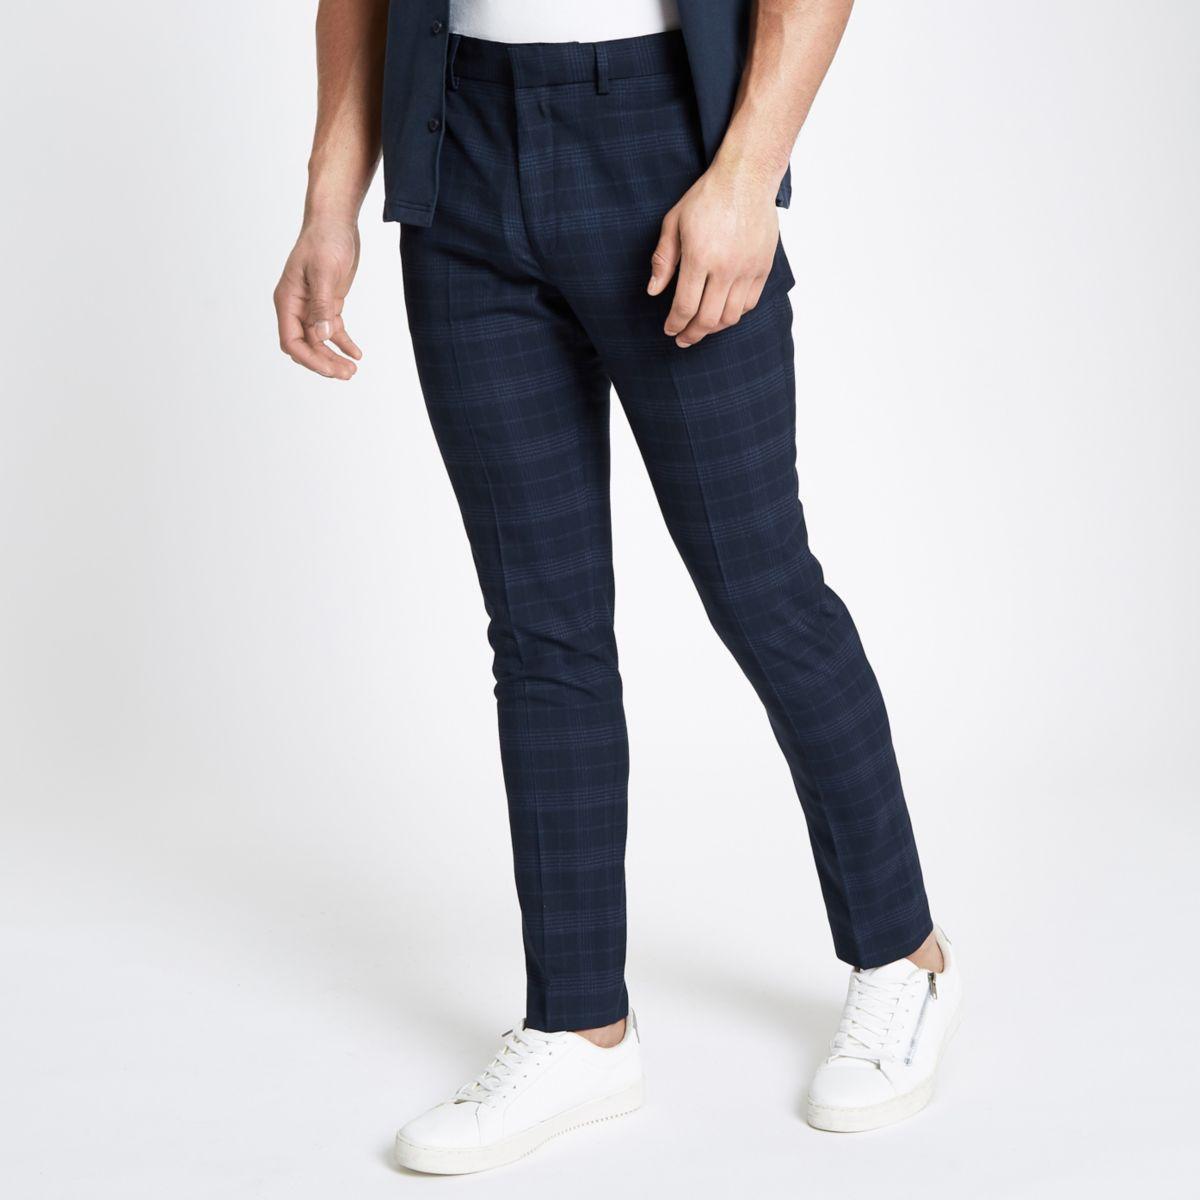 Blue check smart skinny pants